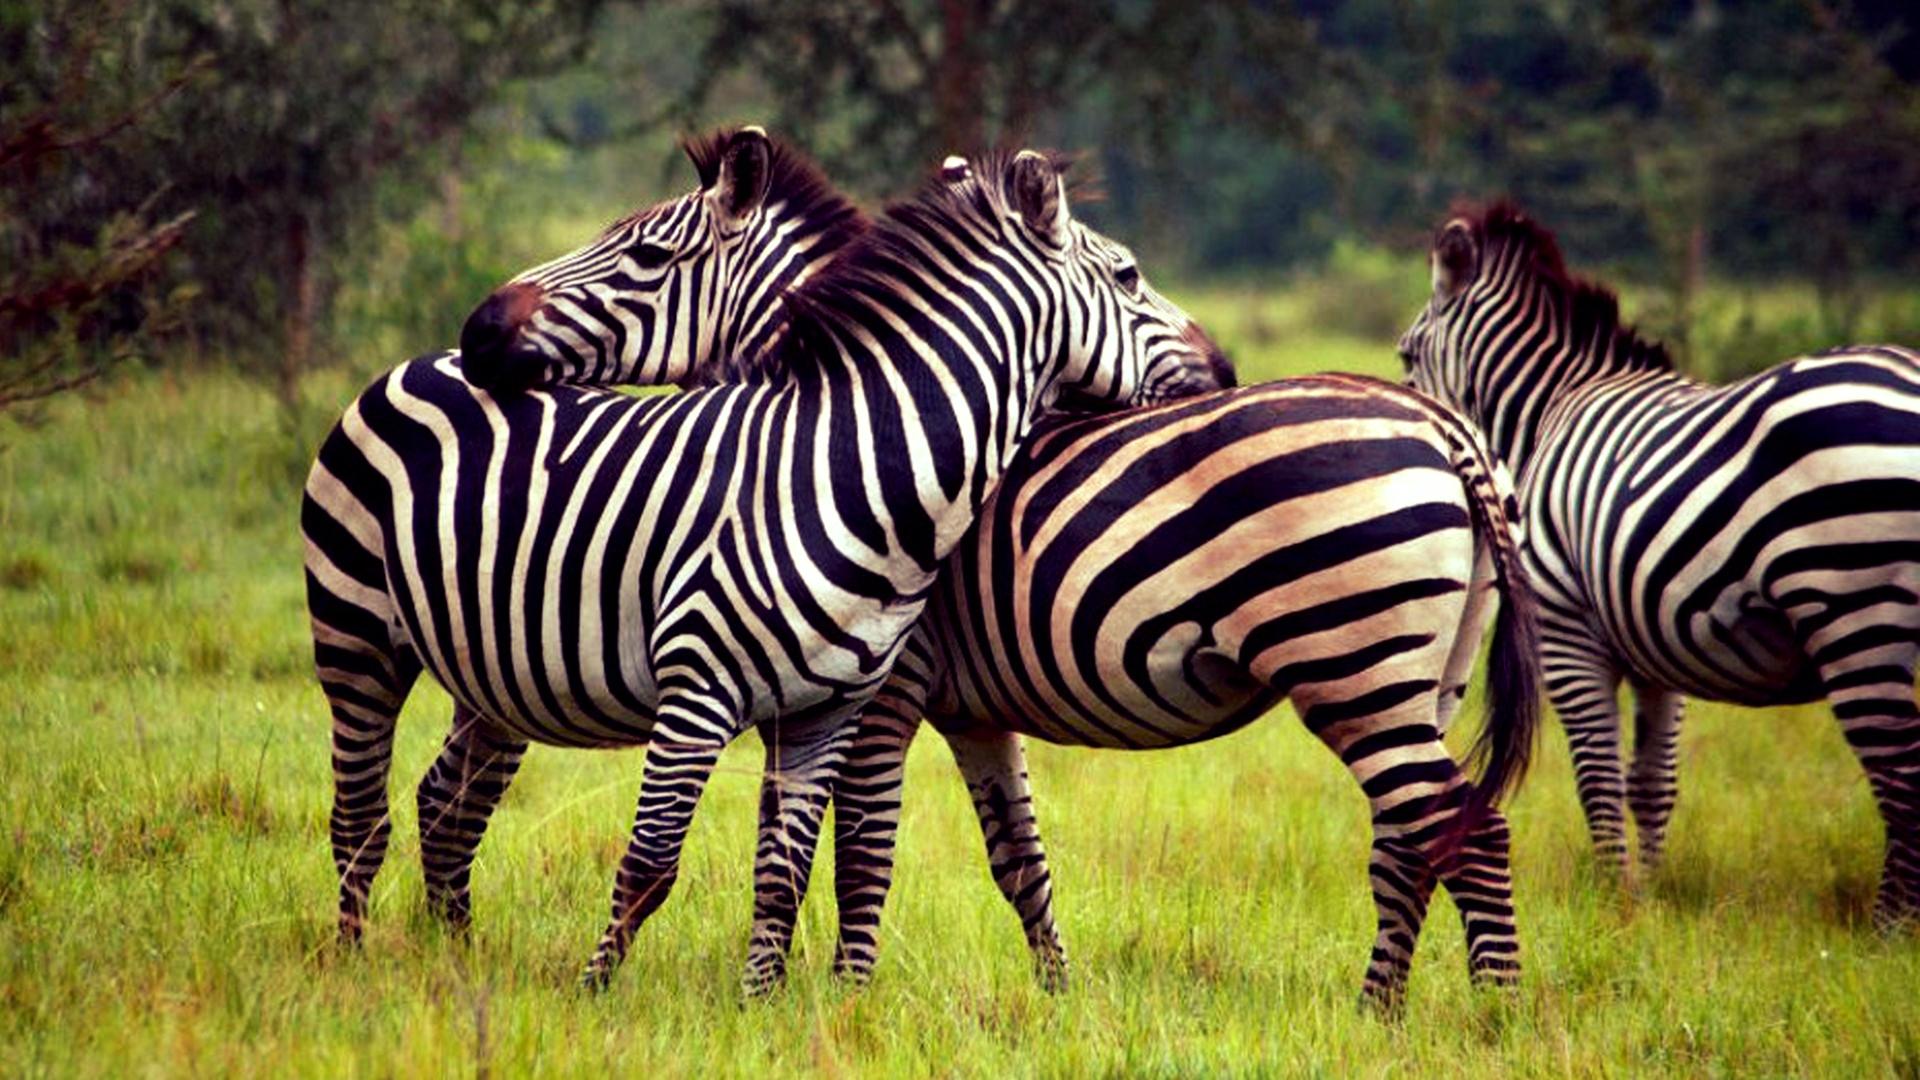 lake mburo zebras instinct safaris.jpg